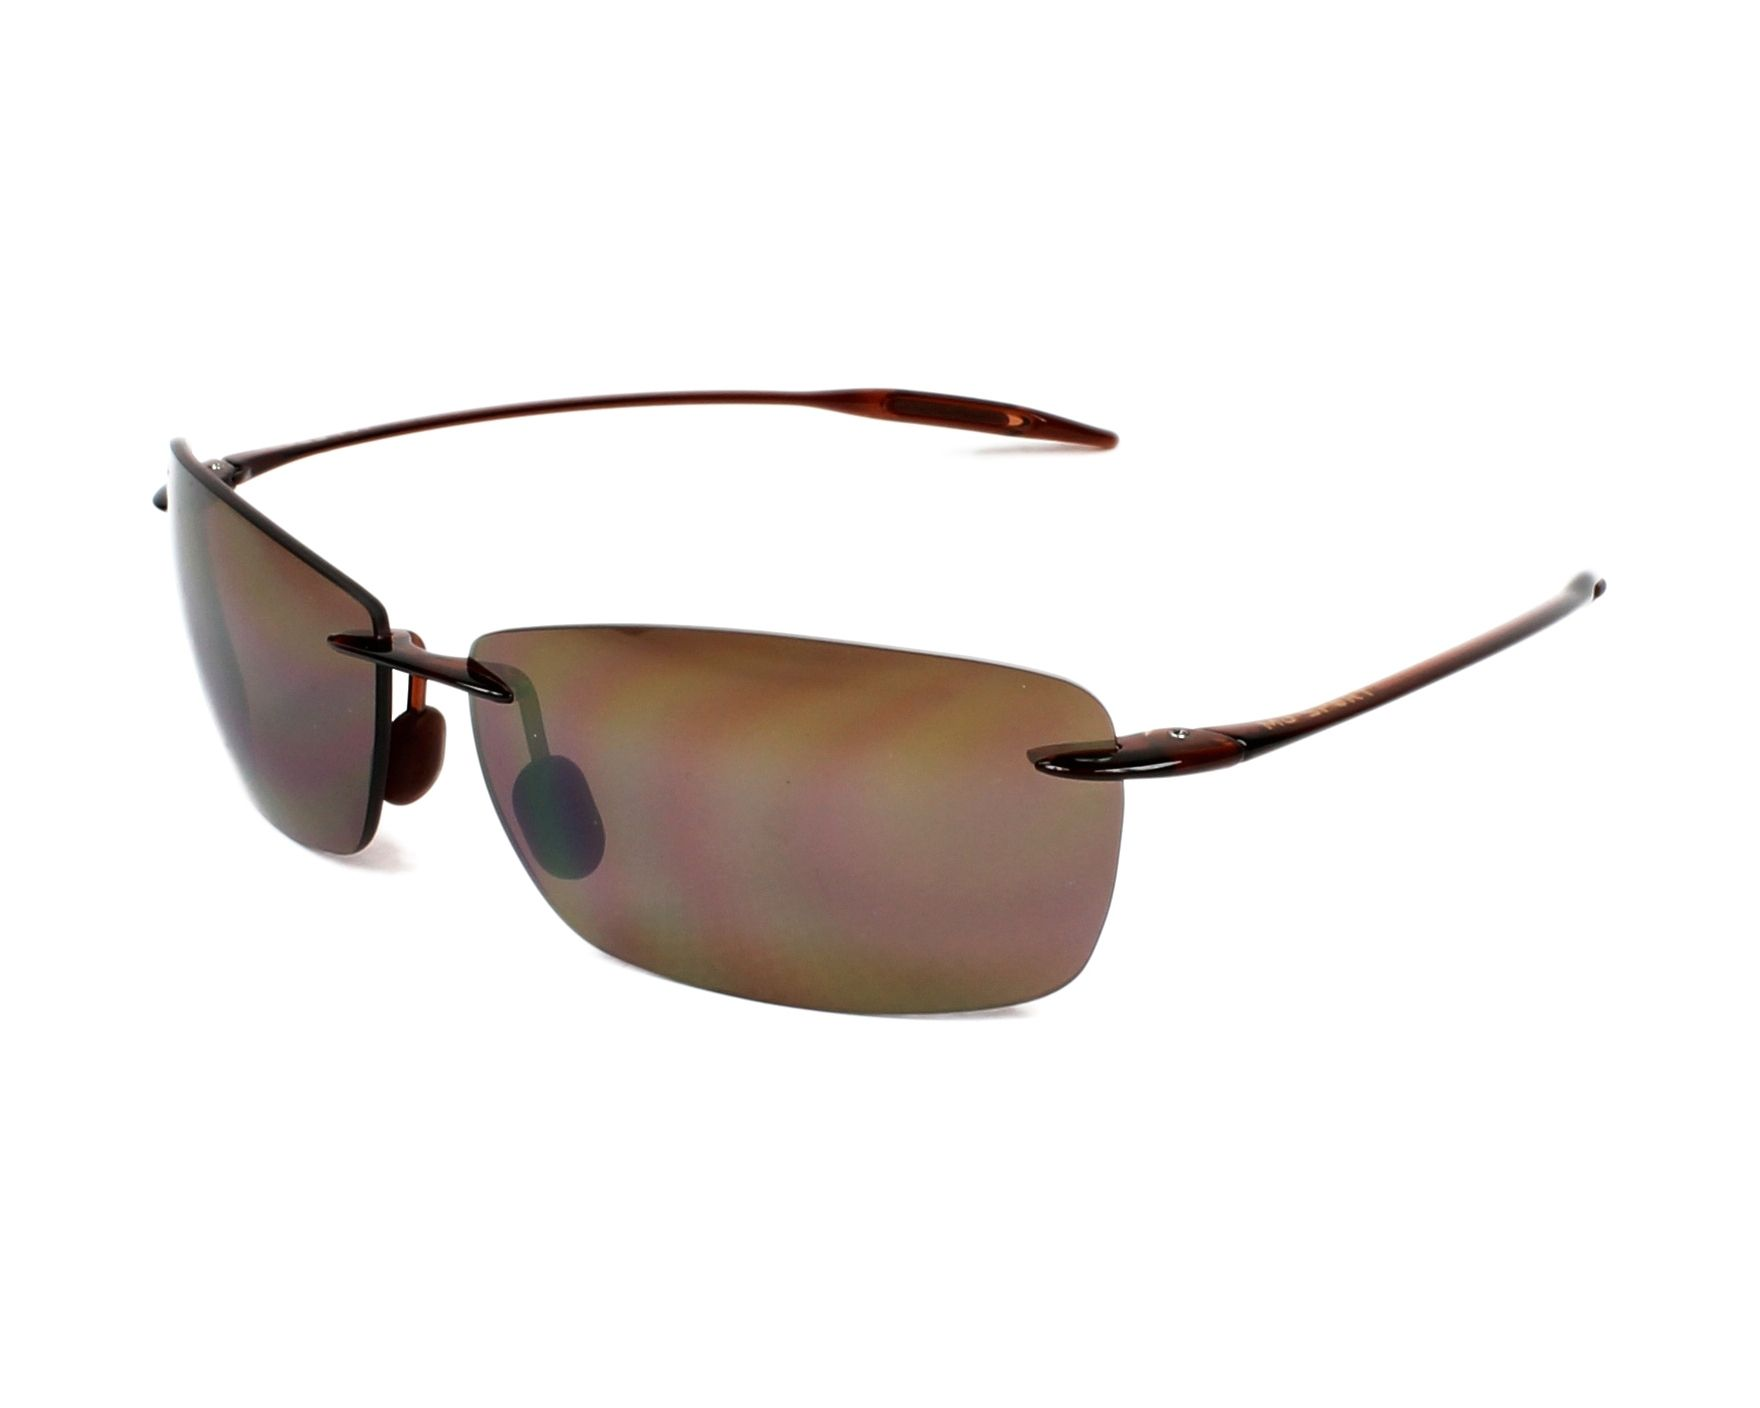 2068130254b Sunglasses Maui Jim H-423 26 67-13 Brown profile view